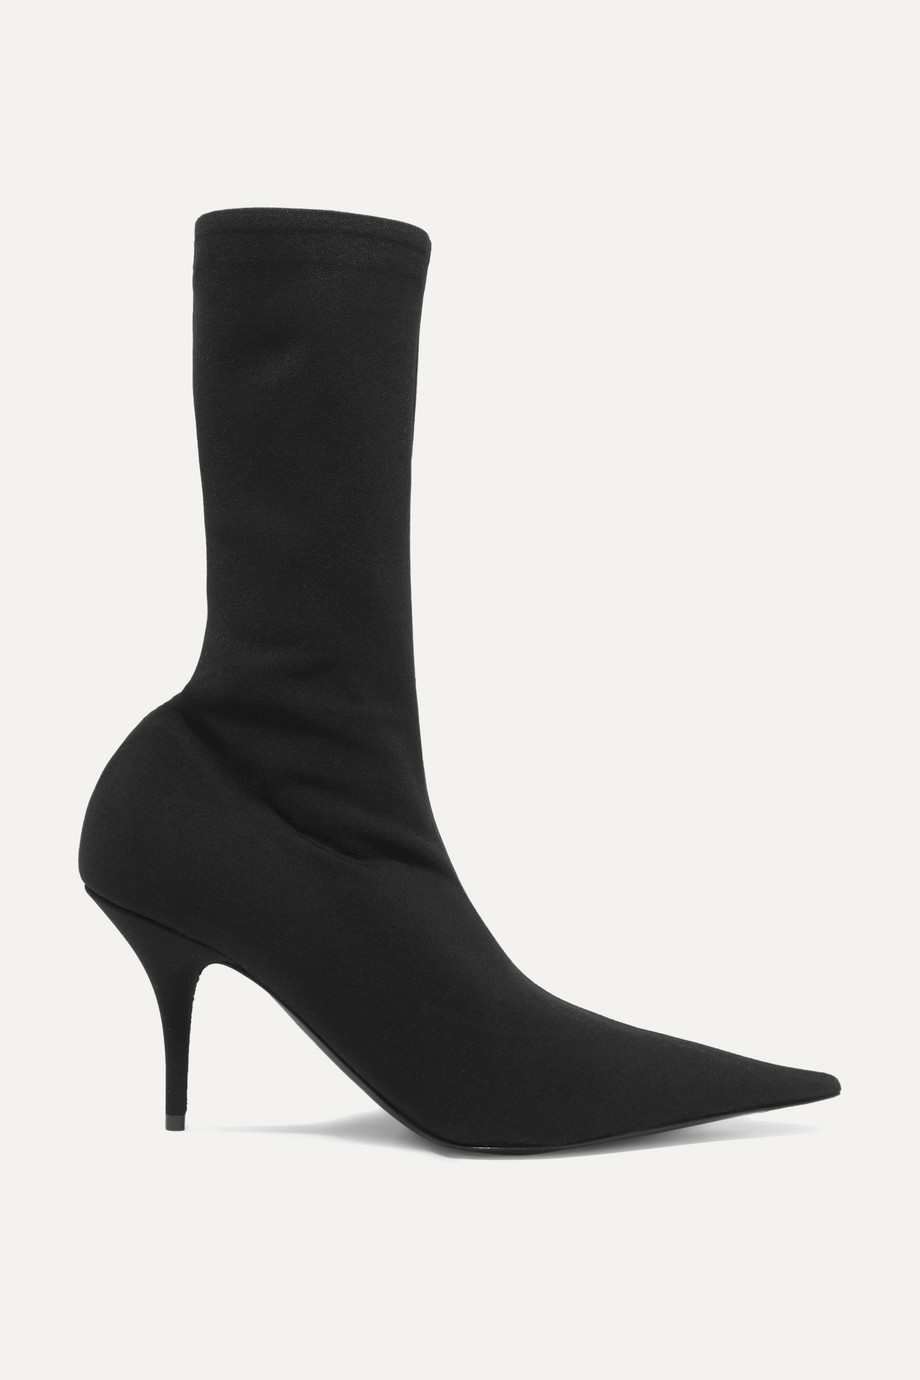 Exact Product: Kim Kardashian Black Pumps Street Style Autumn Winter 2020, Brand: Balenciaga, Available on: net-a-porter.com, Price: $1290